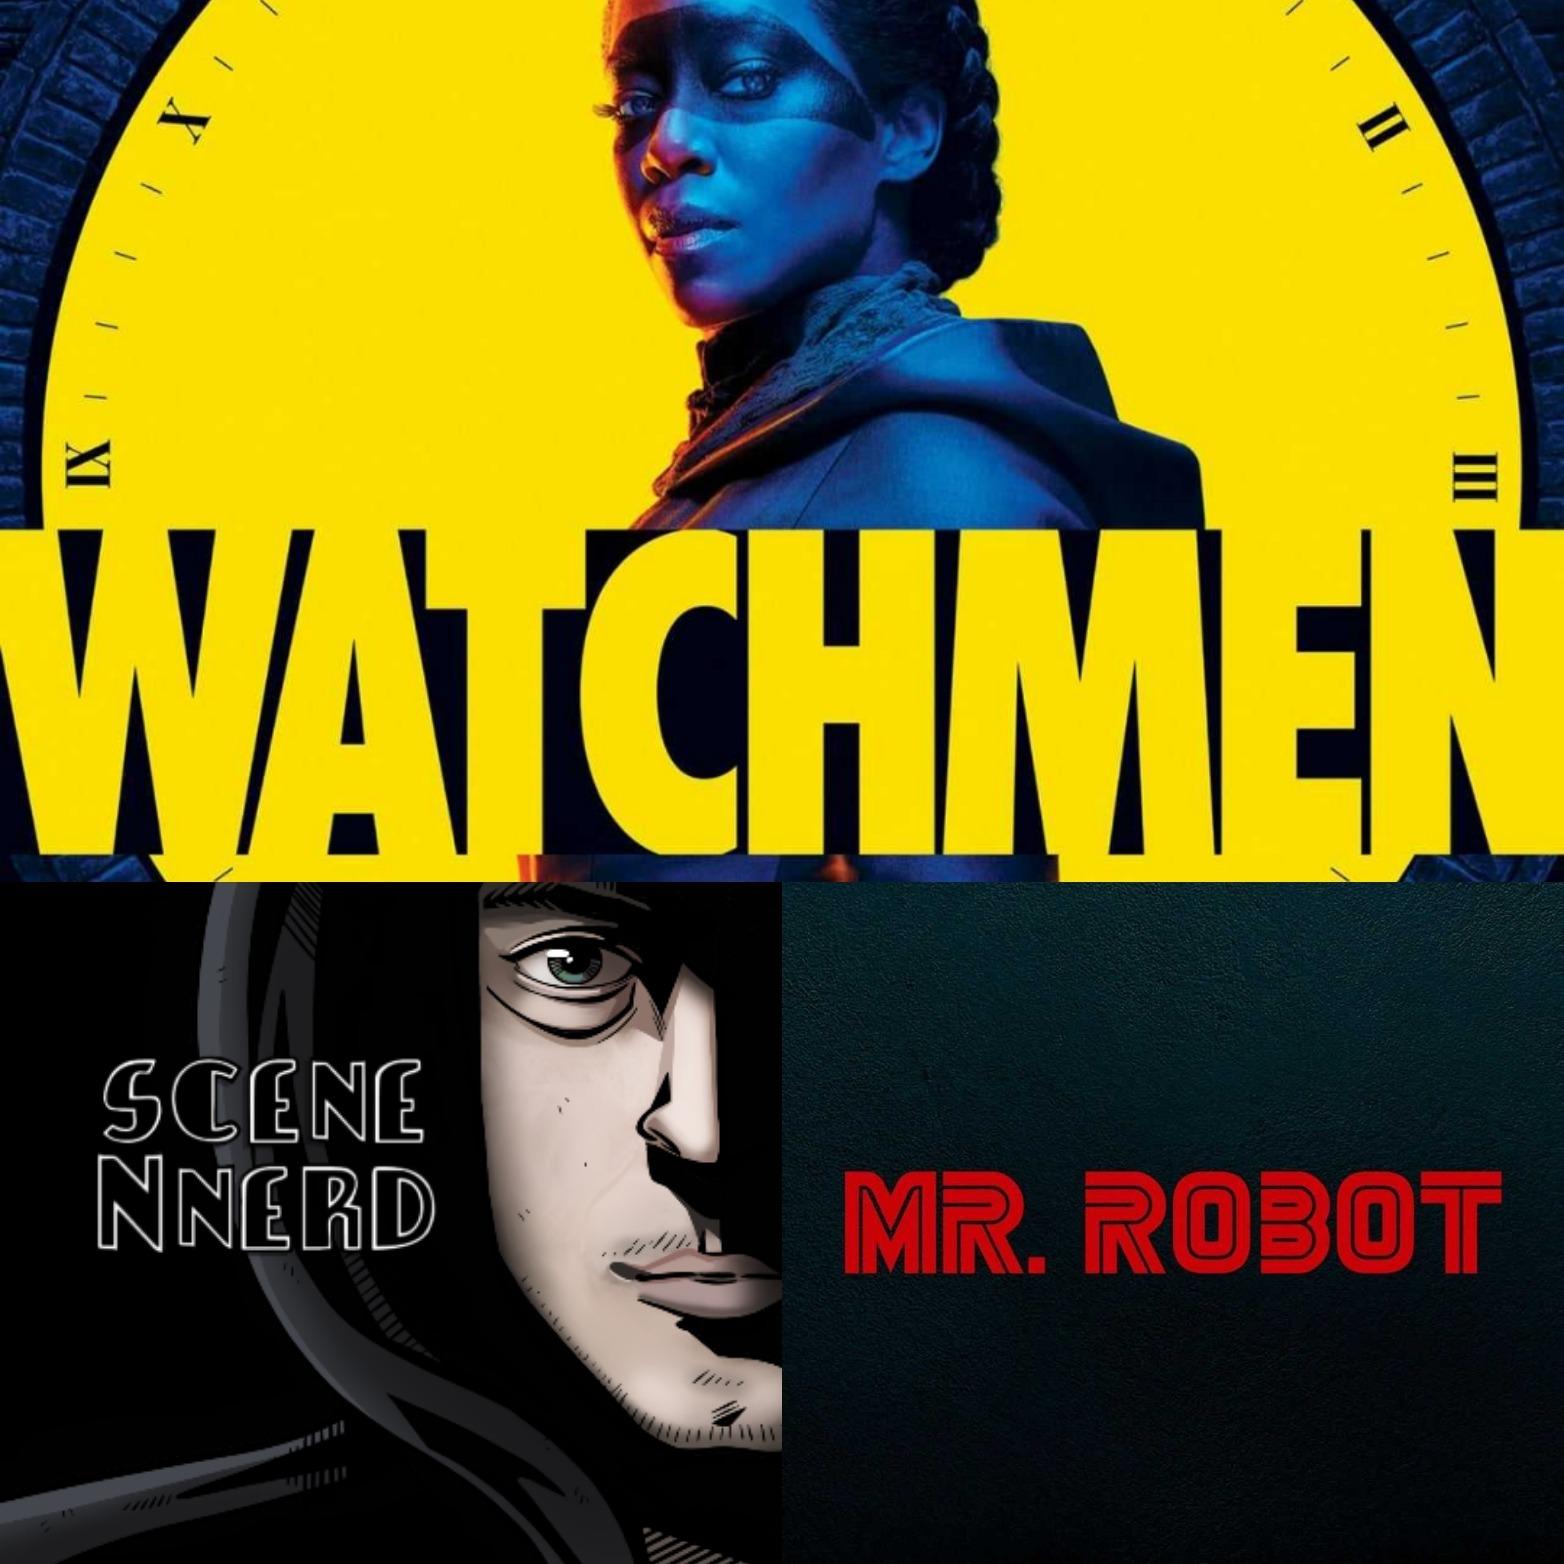 GVN Presents: Scene N Nerd - A Watchmen Finale & a Robot Falls